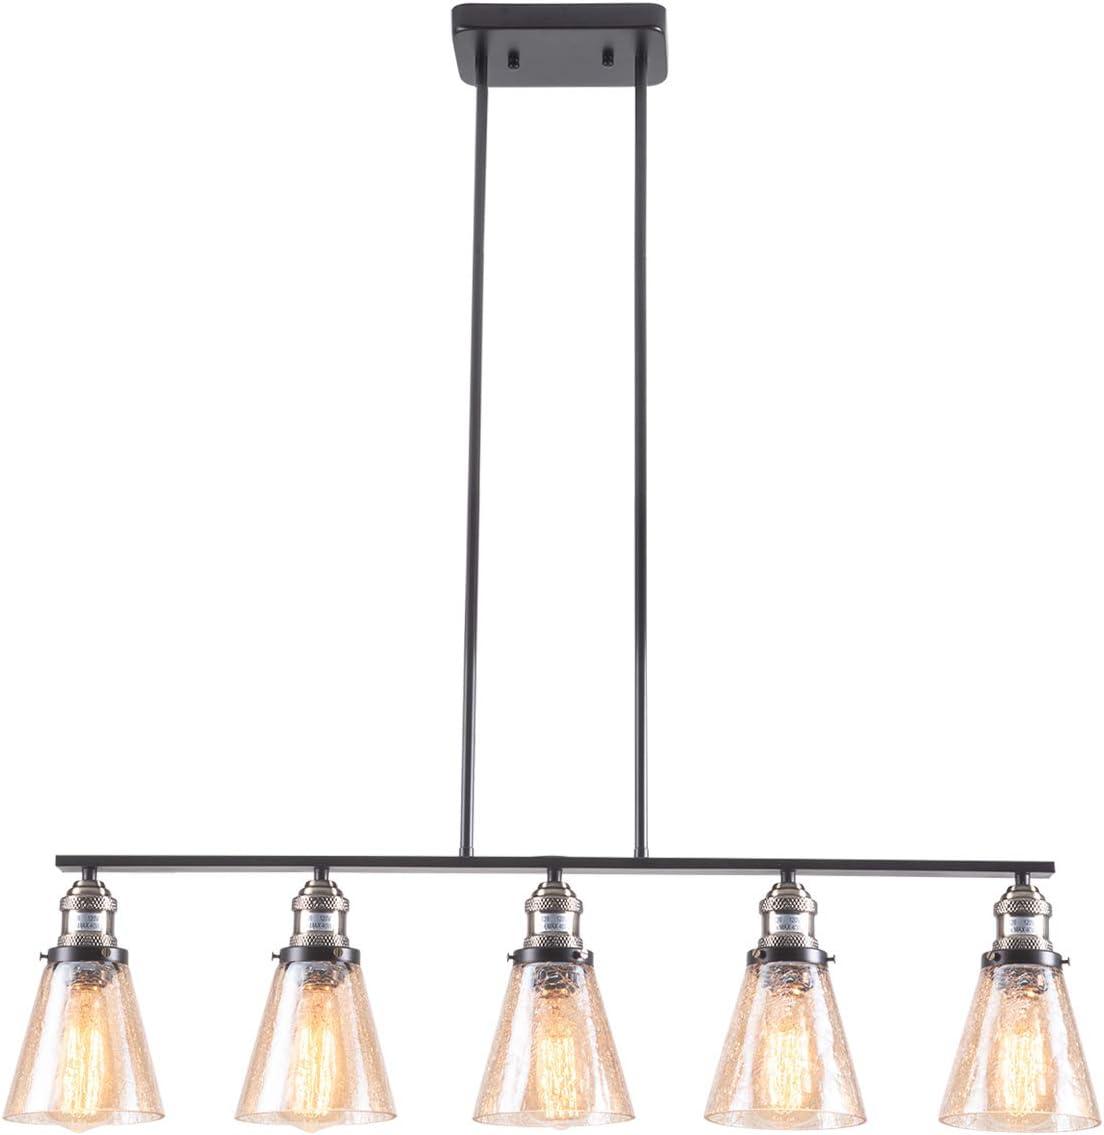 SHENGYADI 5-Light Amber Crackled Glass Pendant Light Modern Kitchen Island Lighting Dining Room Lighting Fixtures Hanging, Matte Black Finish